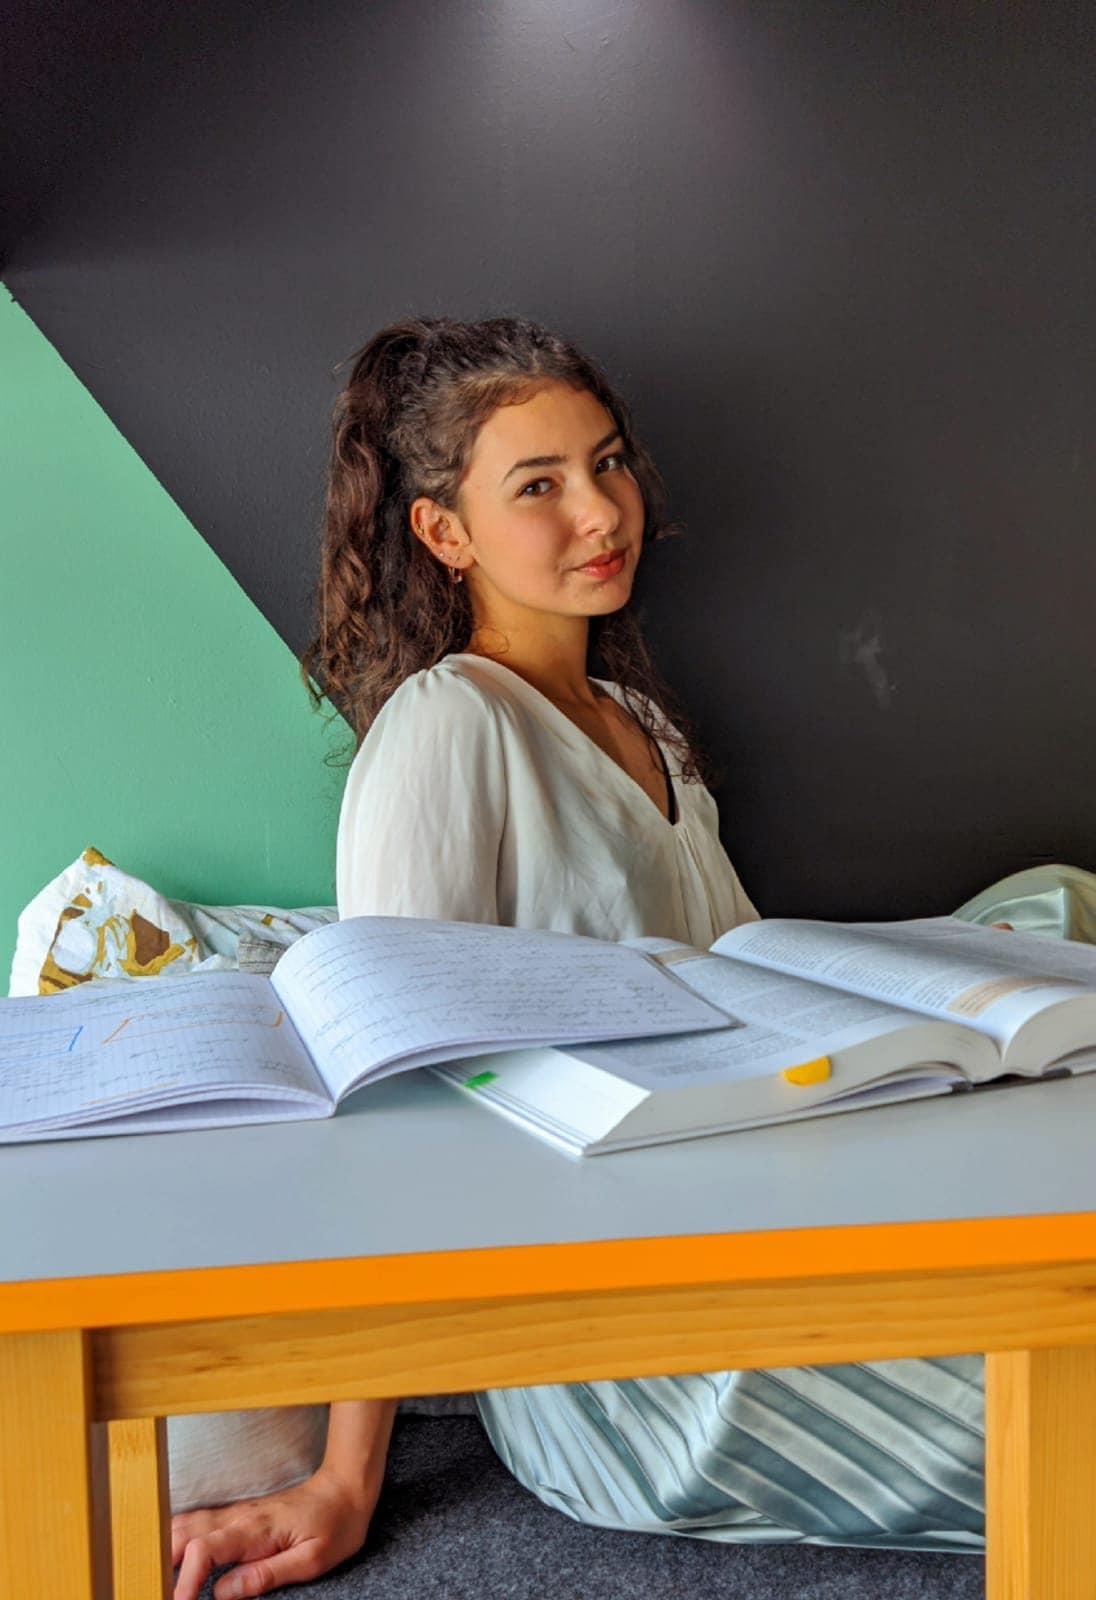 Foto: Sarajlić Emina / Hub Homework